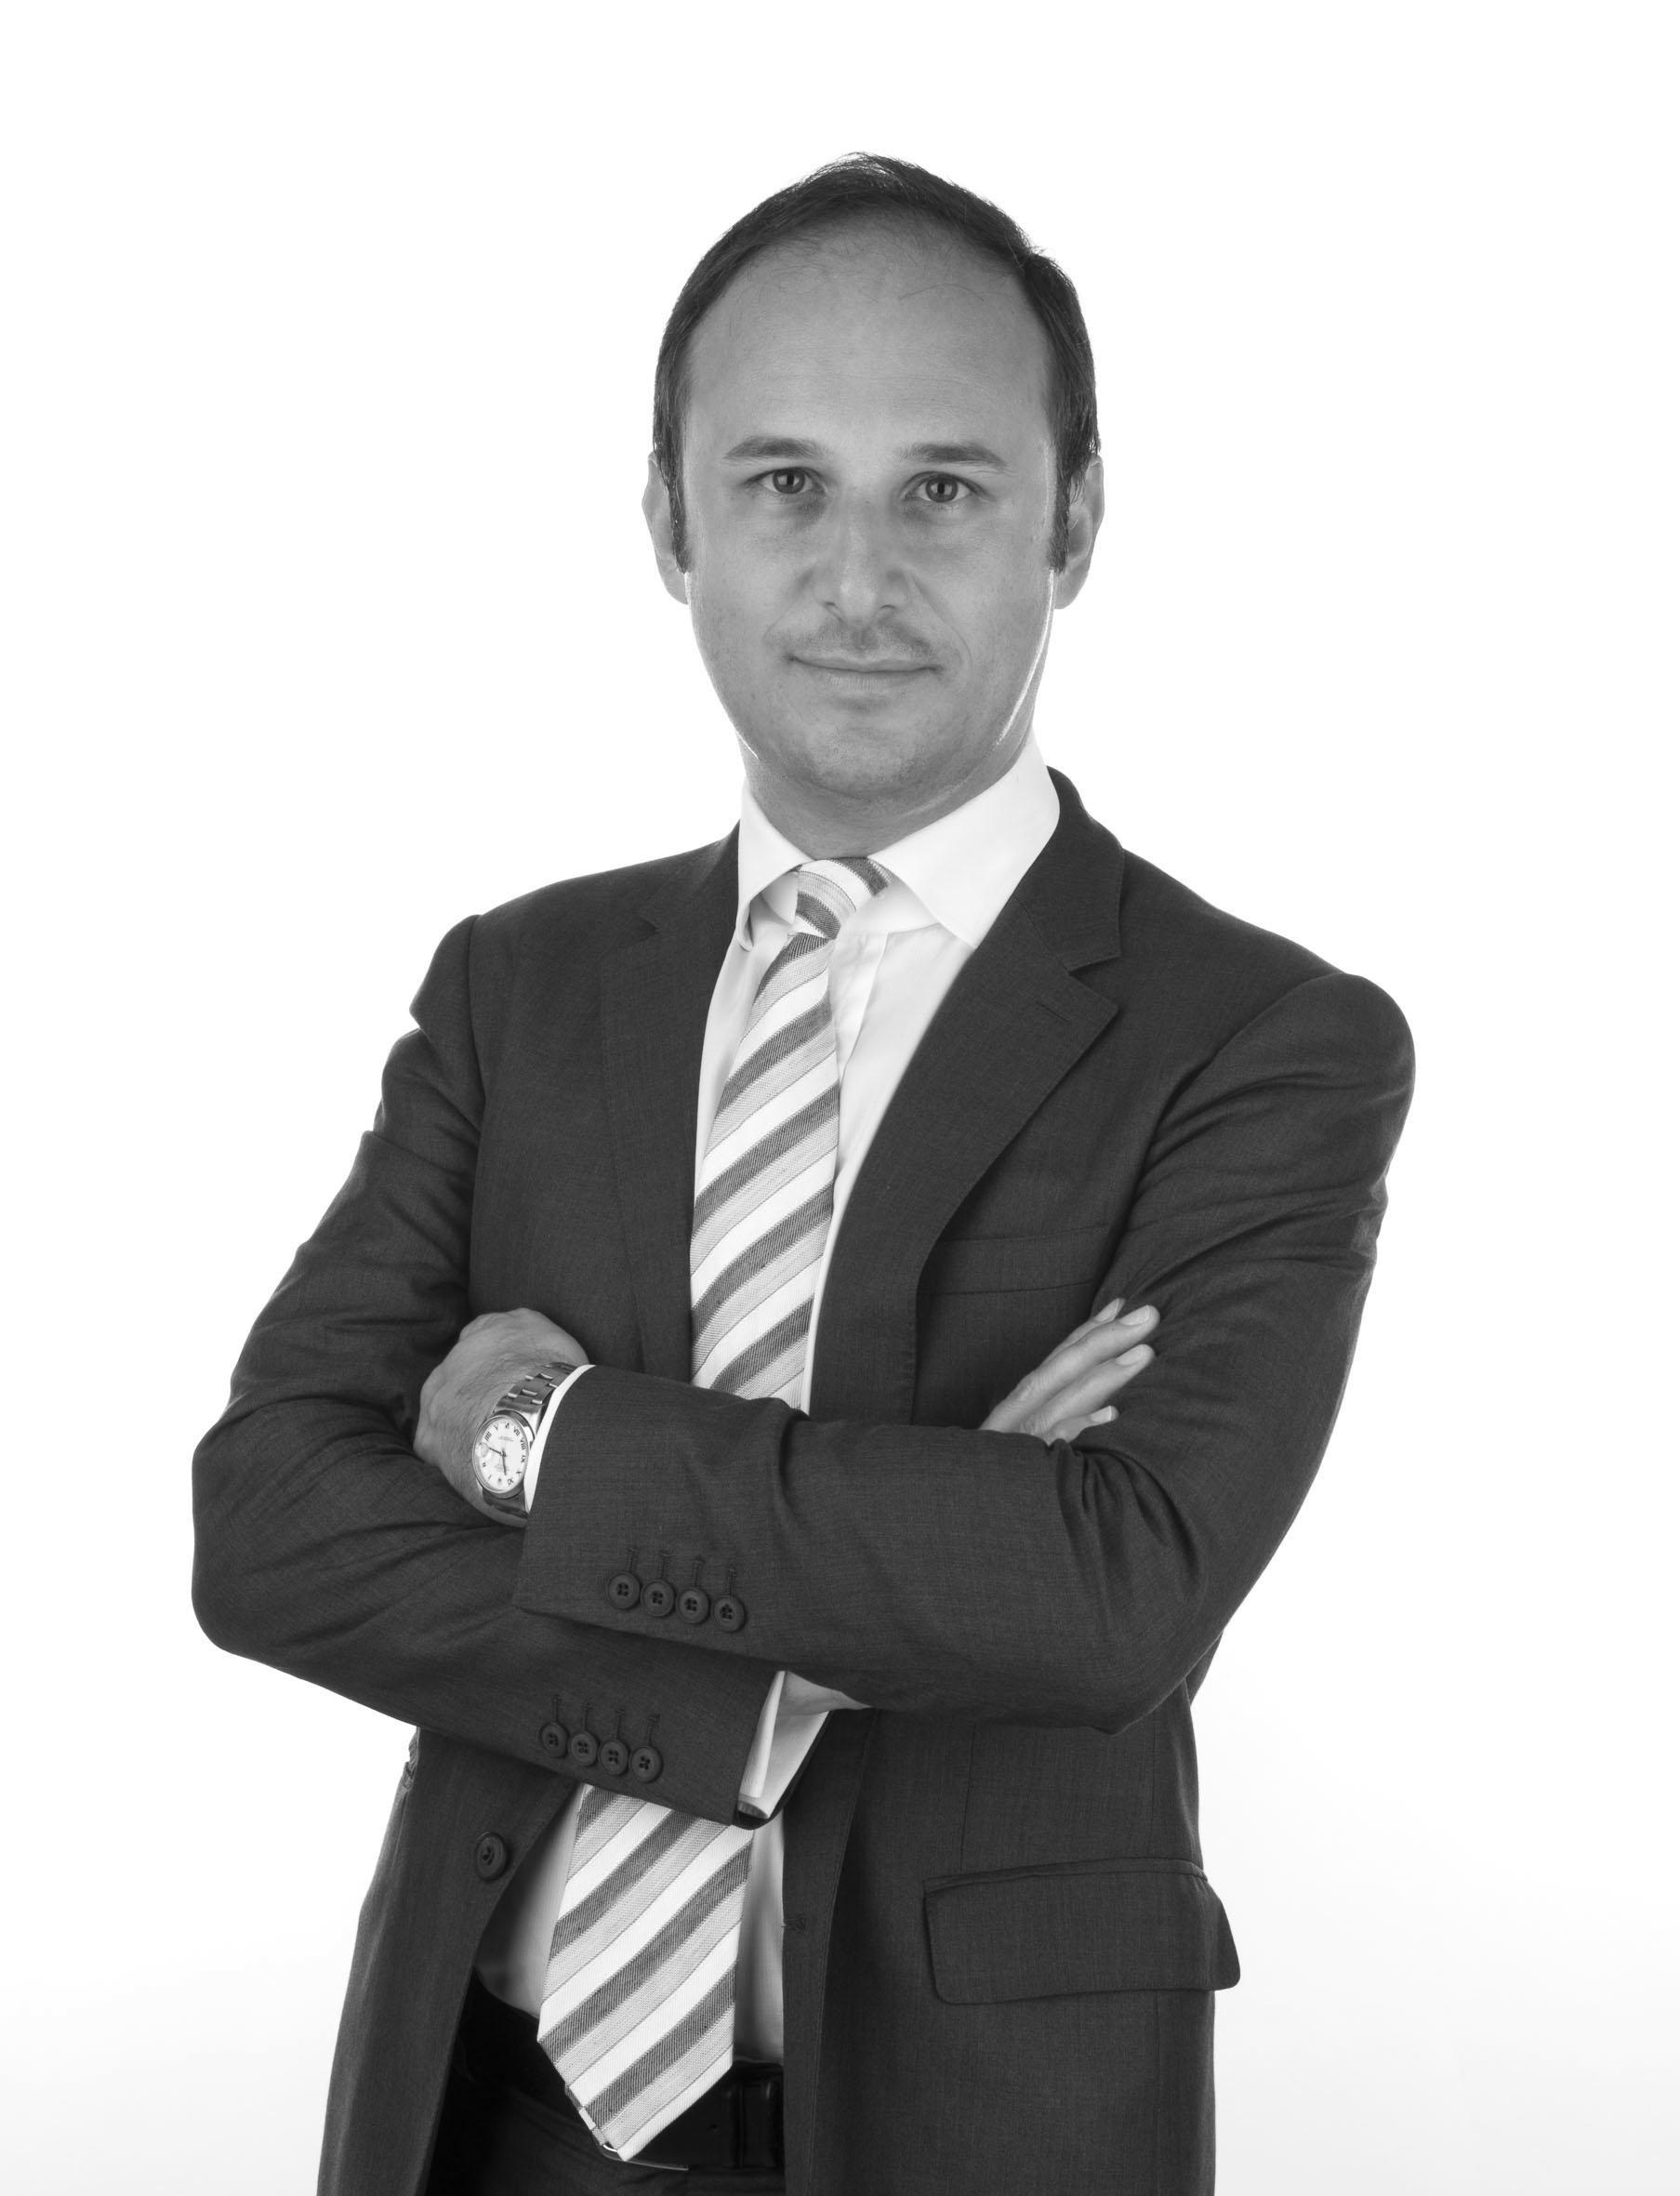 Fabio De Matteis